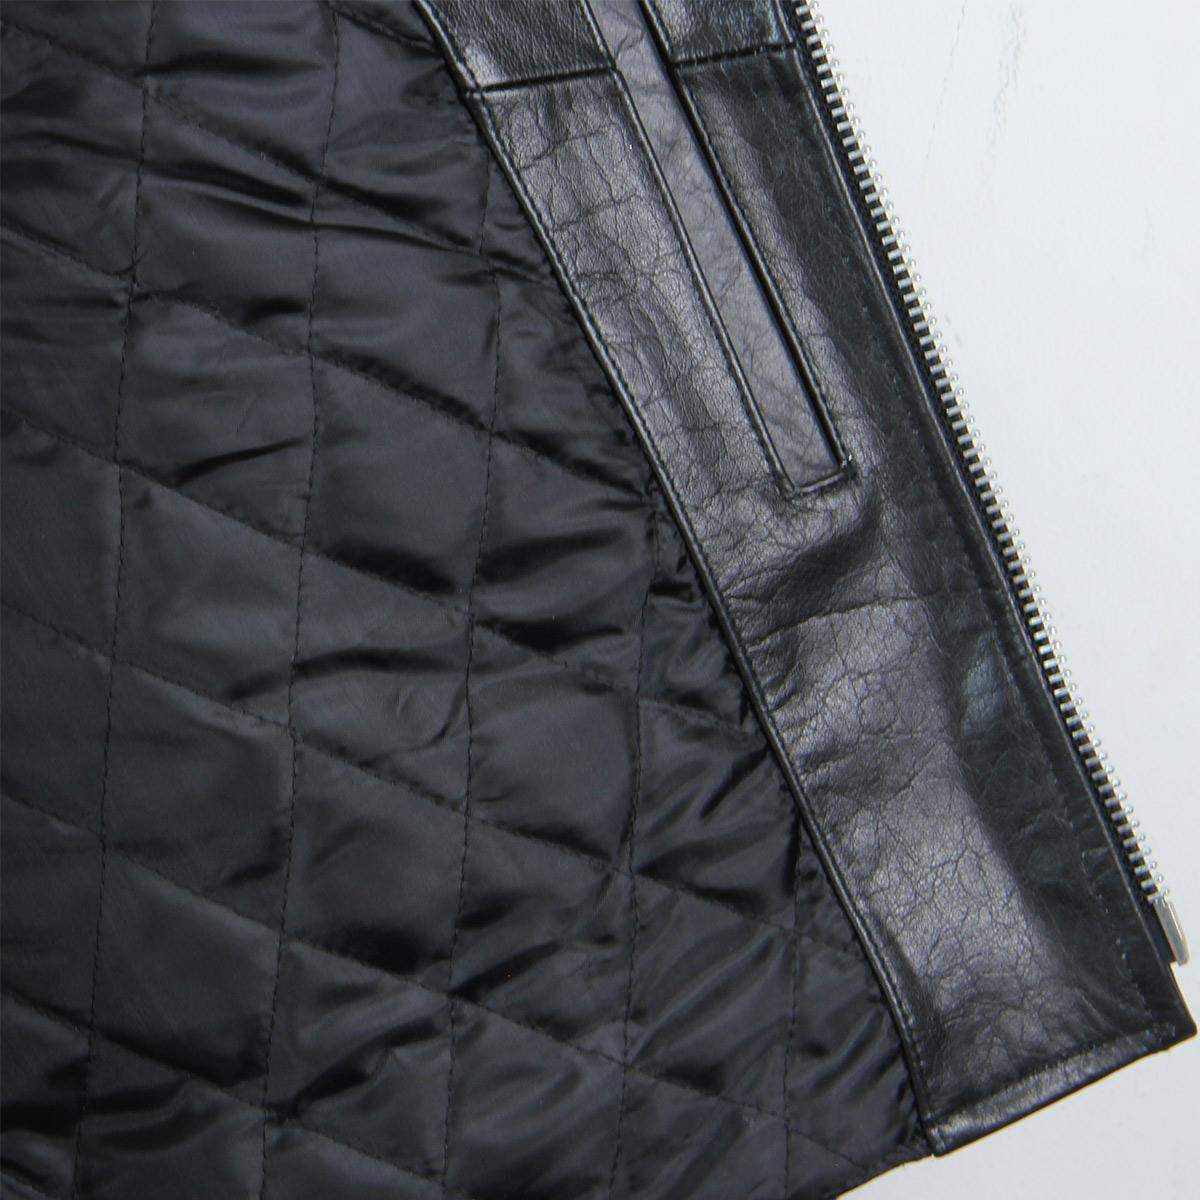 Black-TOP-GRADE-Leather-Motorcycle-Biker-Jacket-4